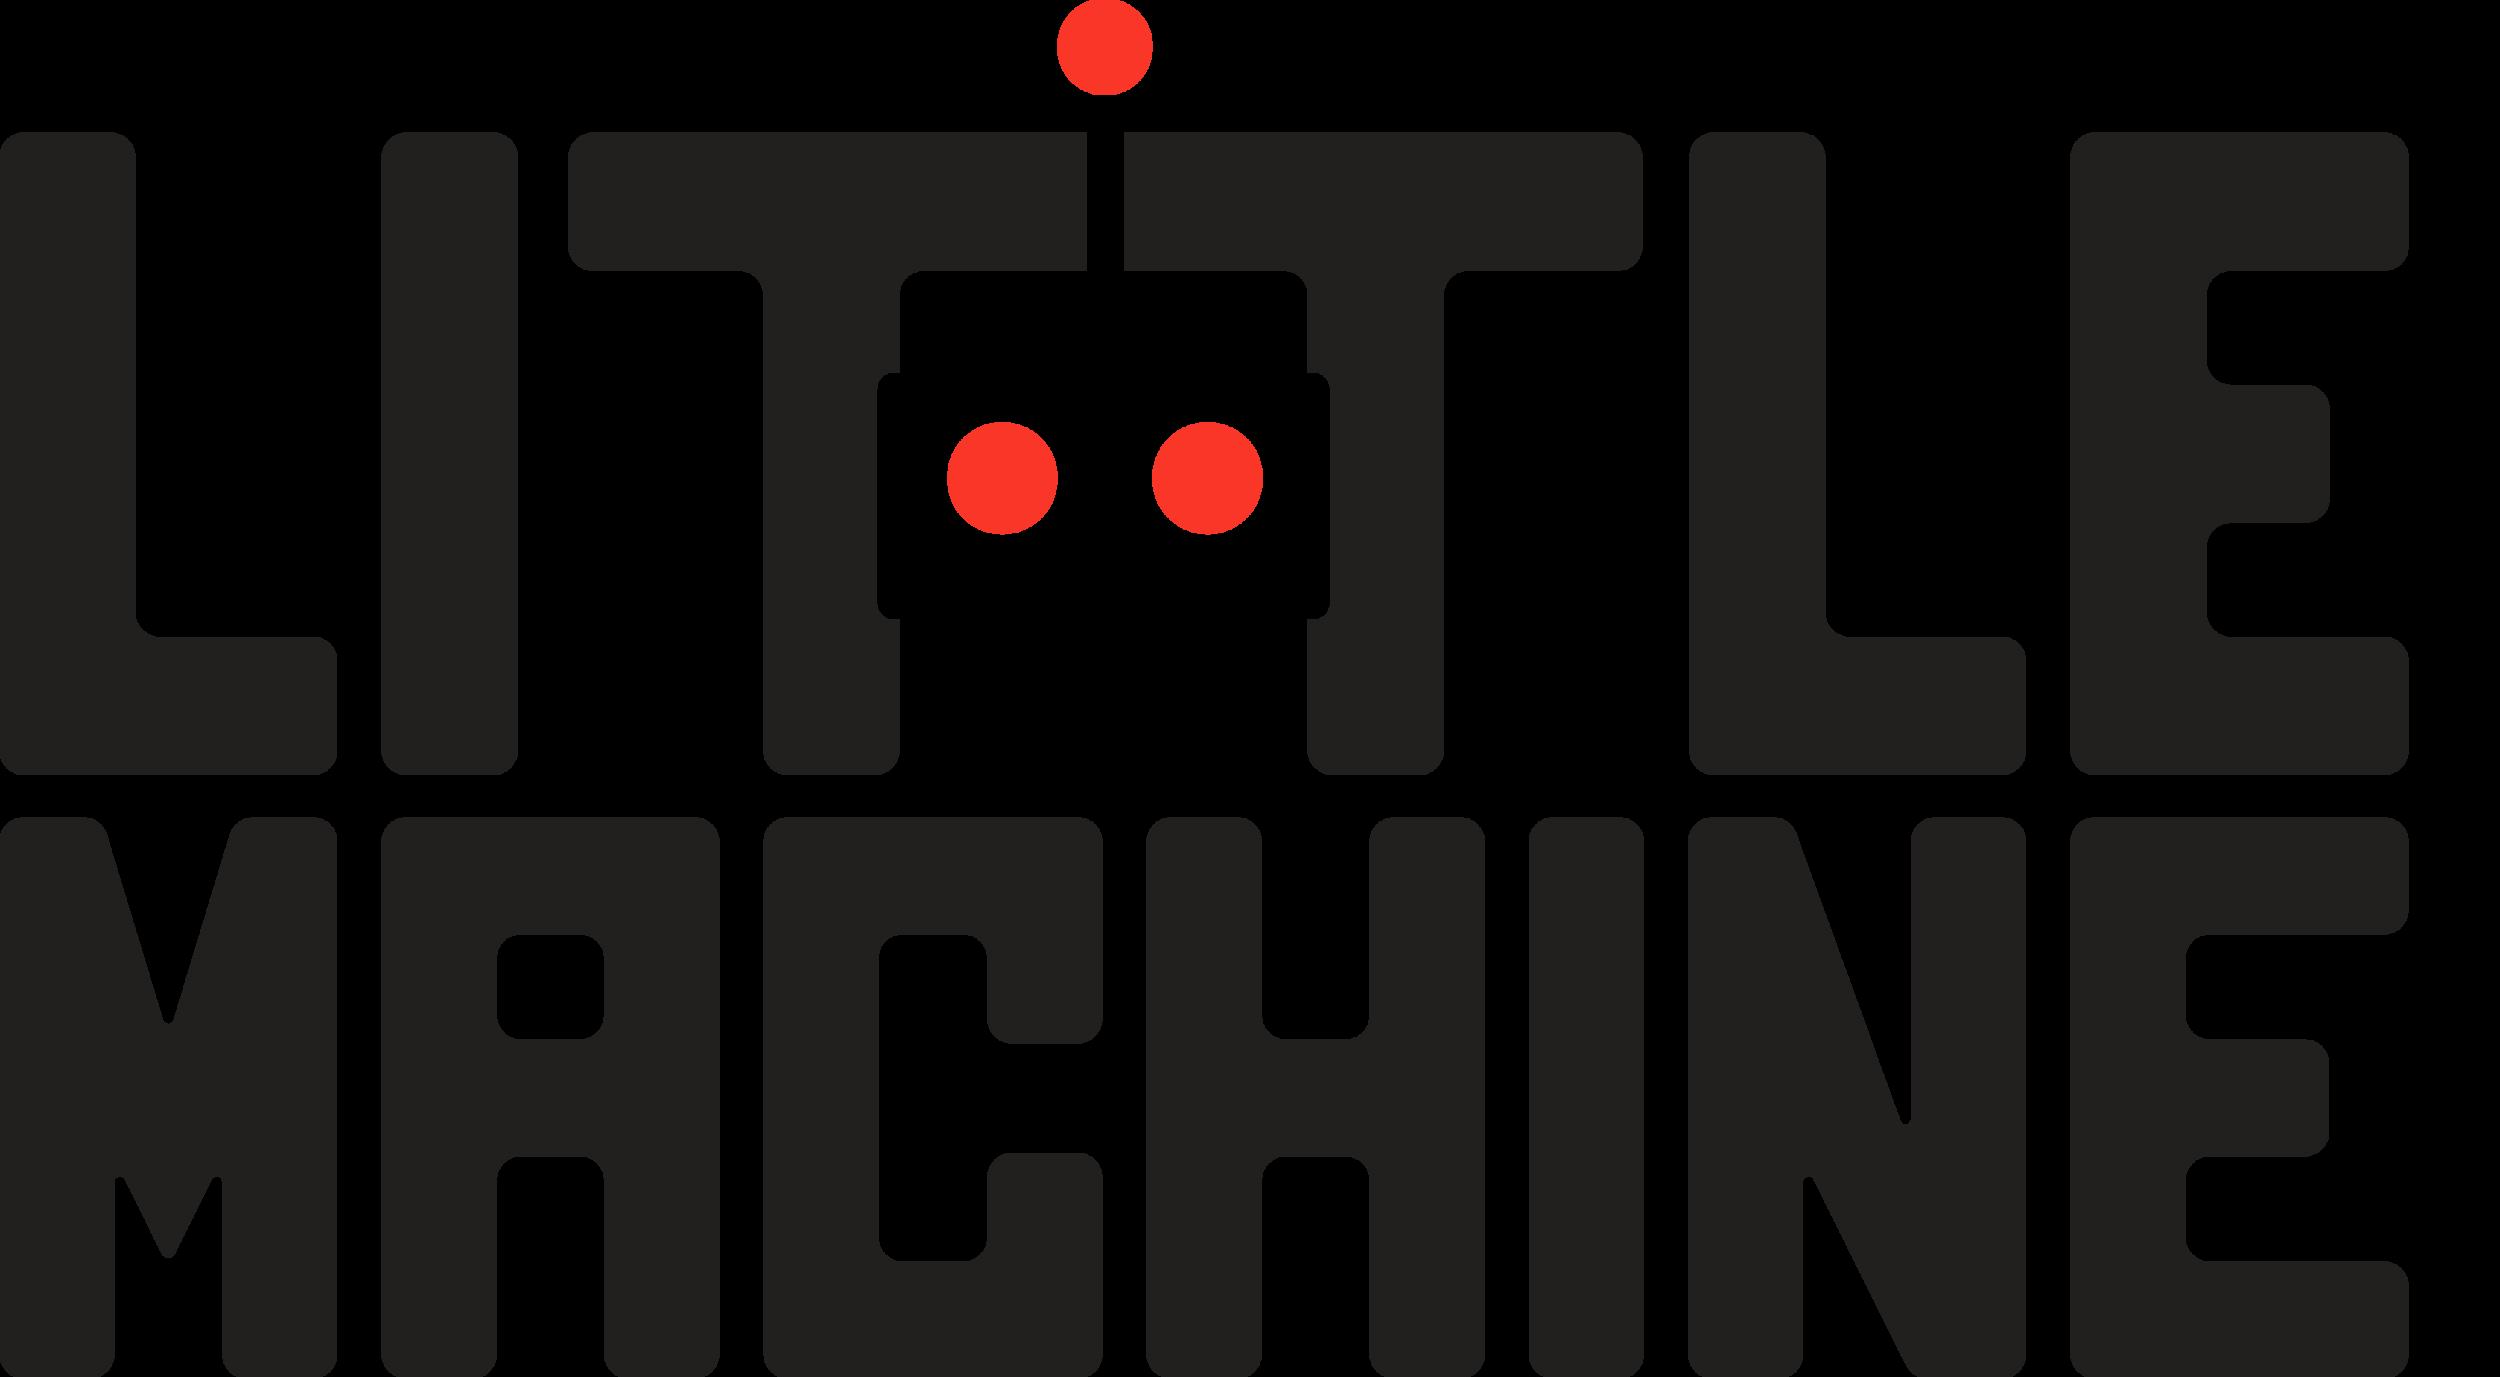 Little_Machine_Master_NEW_TM.png